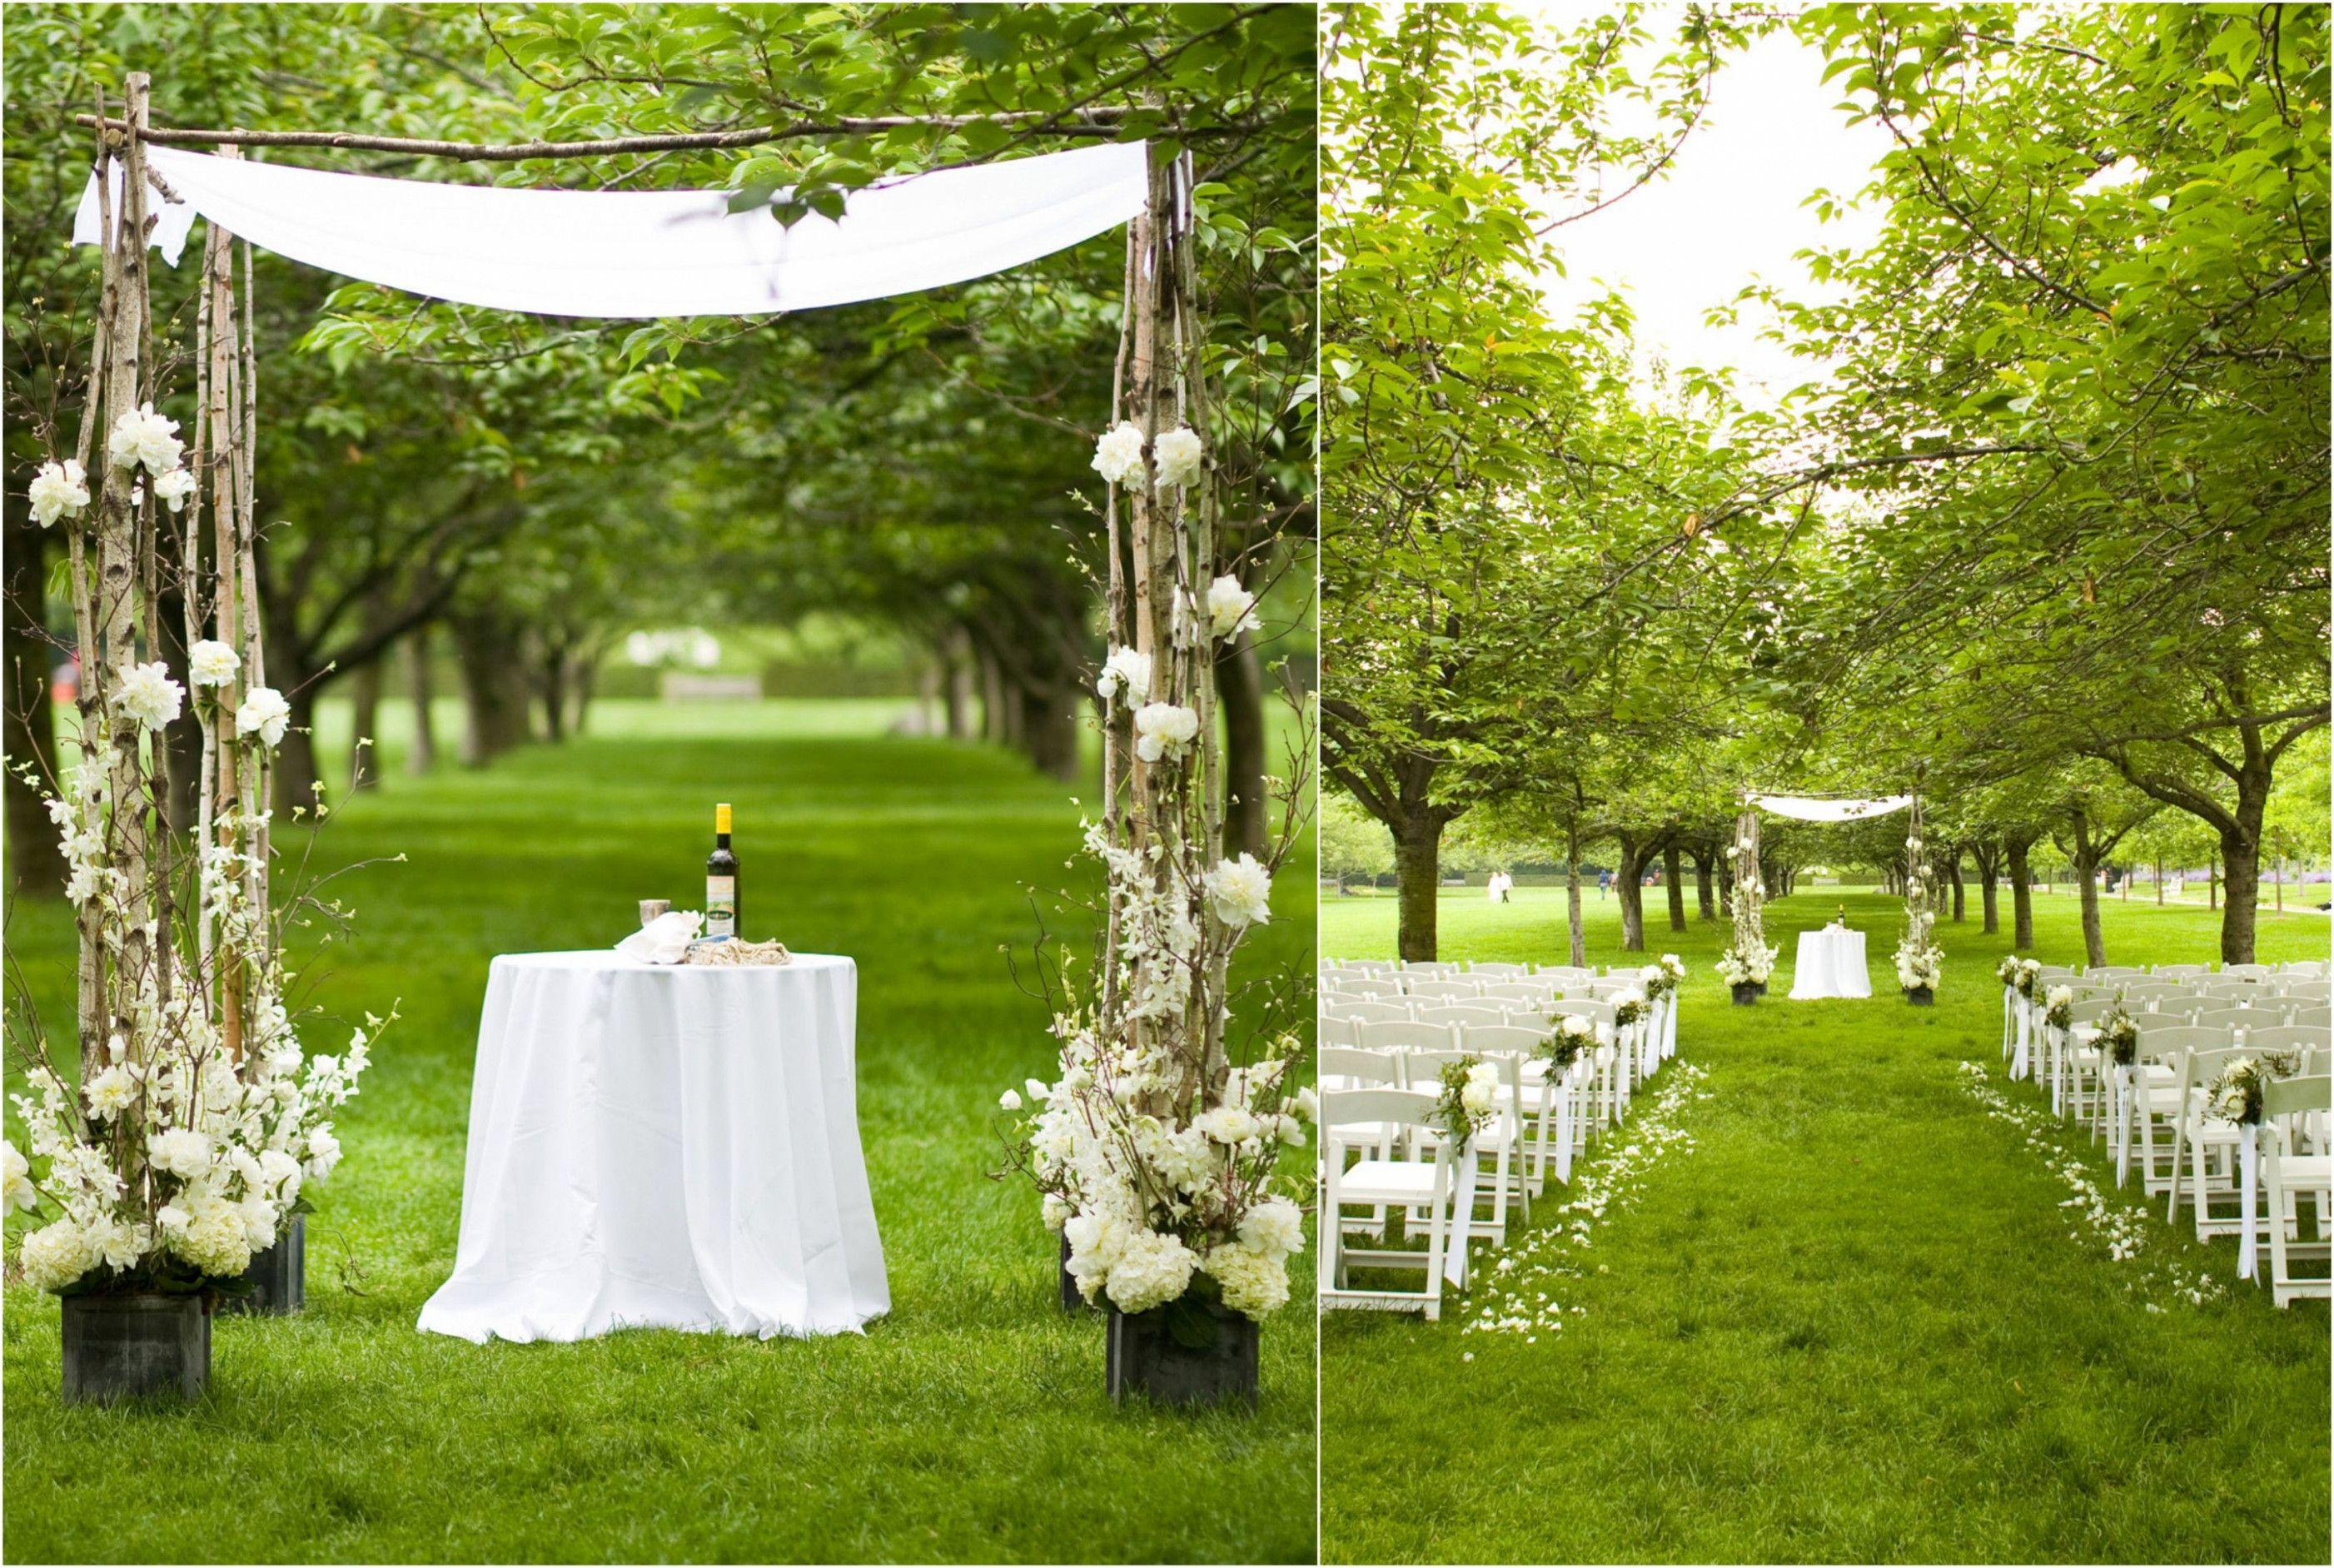 Wedding Ceremony Decorations - Geekleetist   Cheap wedding ...